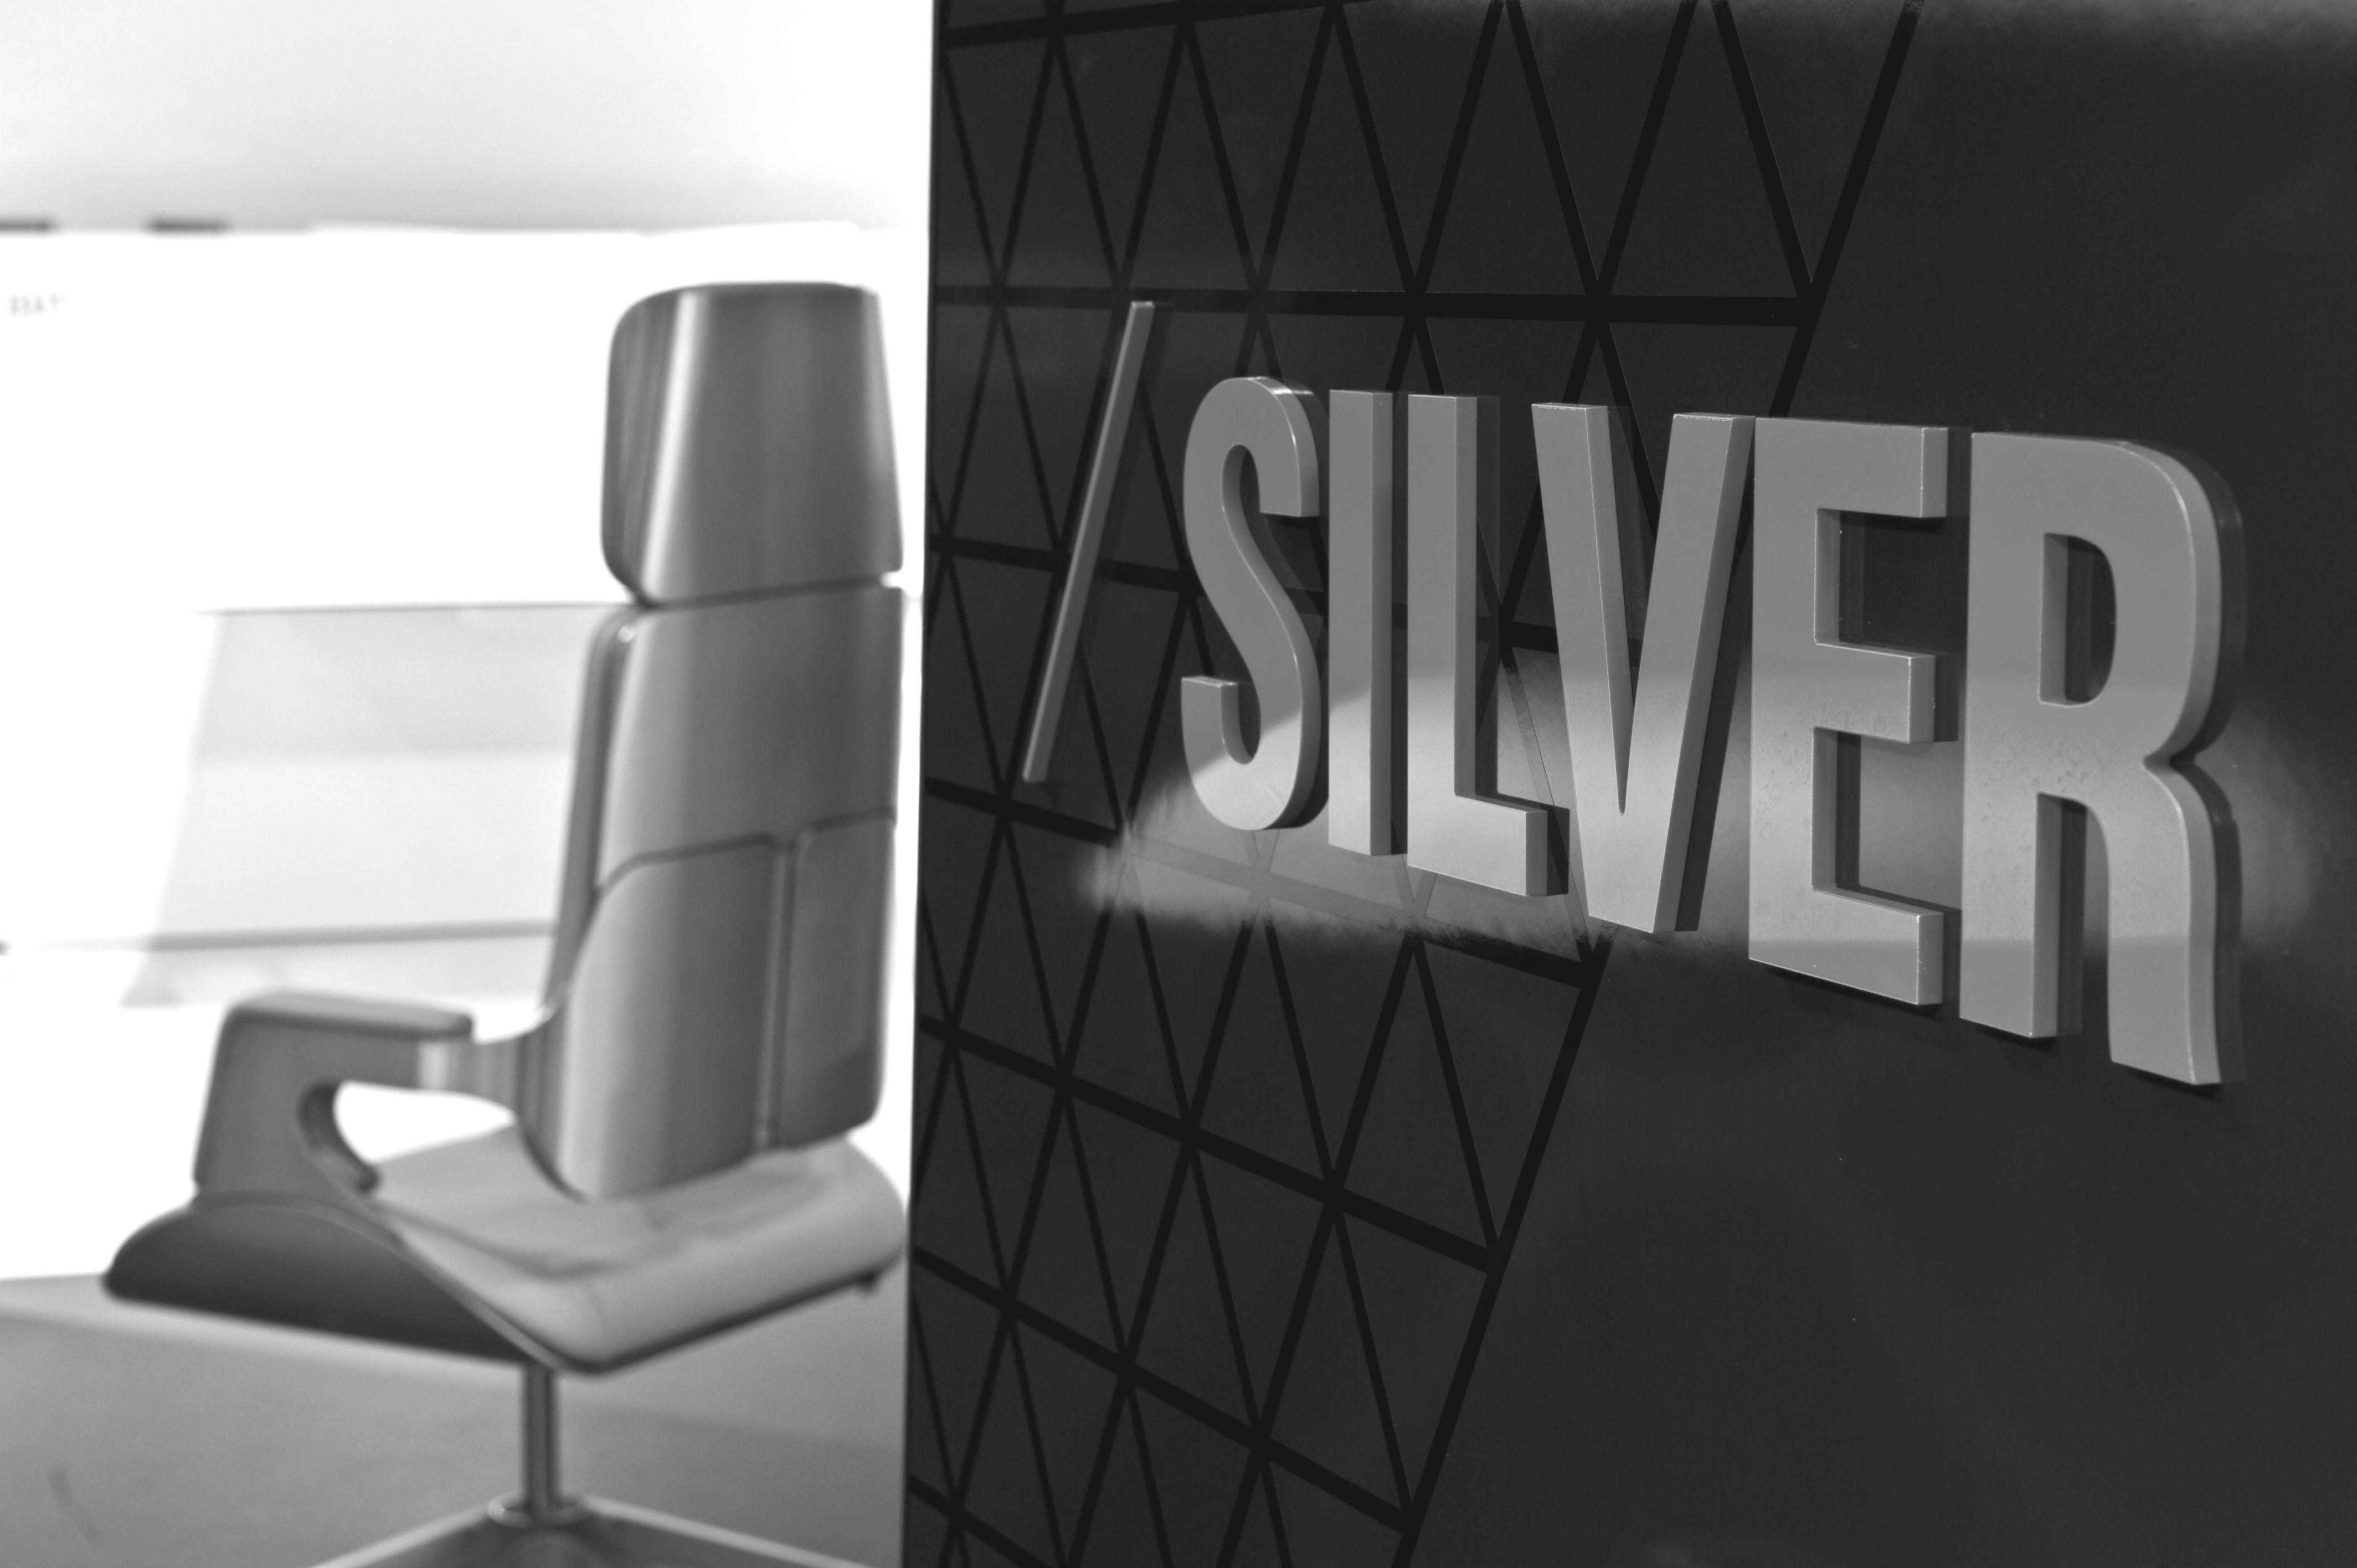 Interstuhl Silver in silver and gold by Hadji Teherani Design Chairs